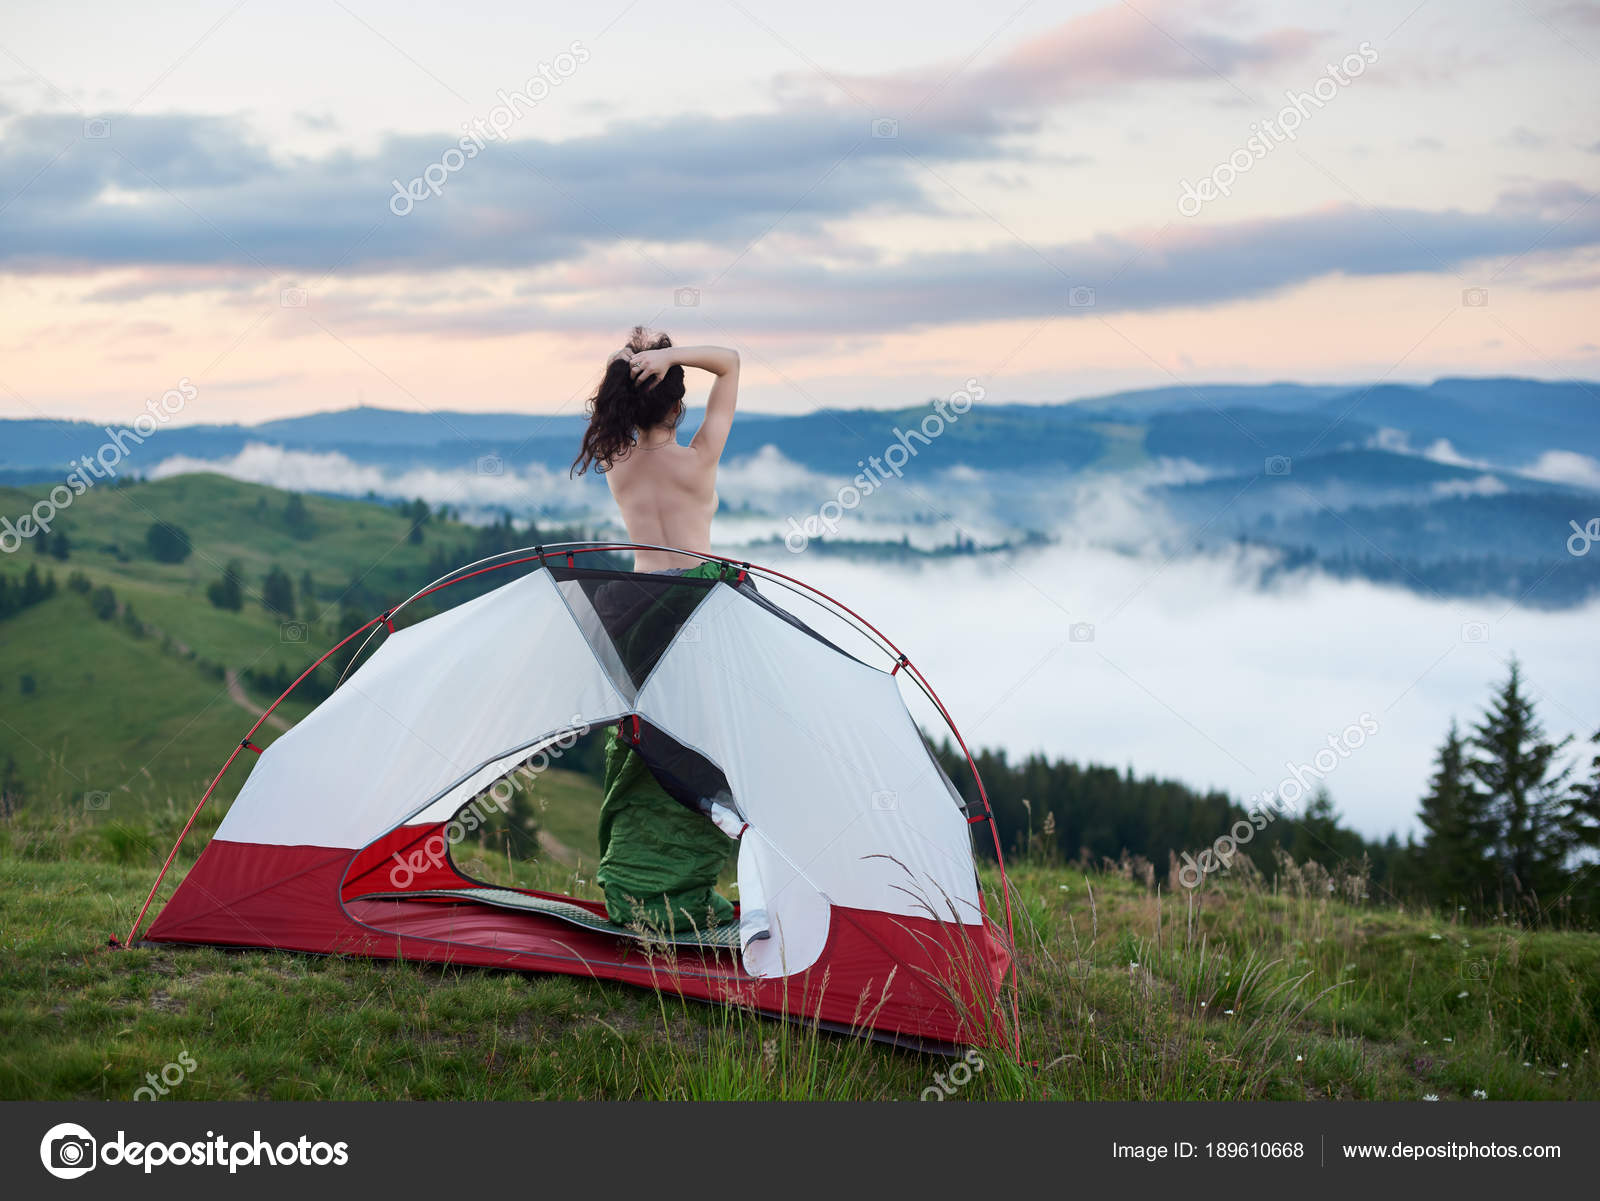 Naked Mountain Climbing Stock Photos, Pictures & Royalty